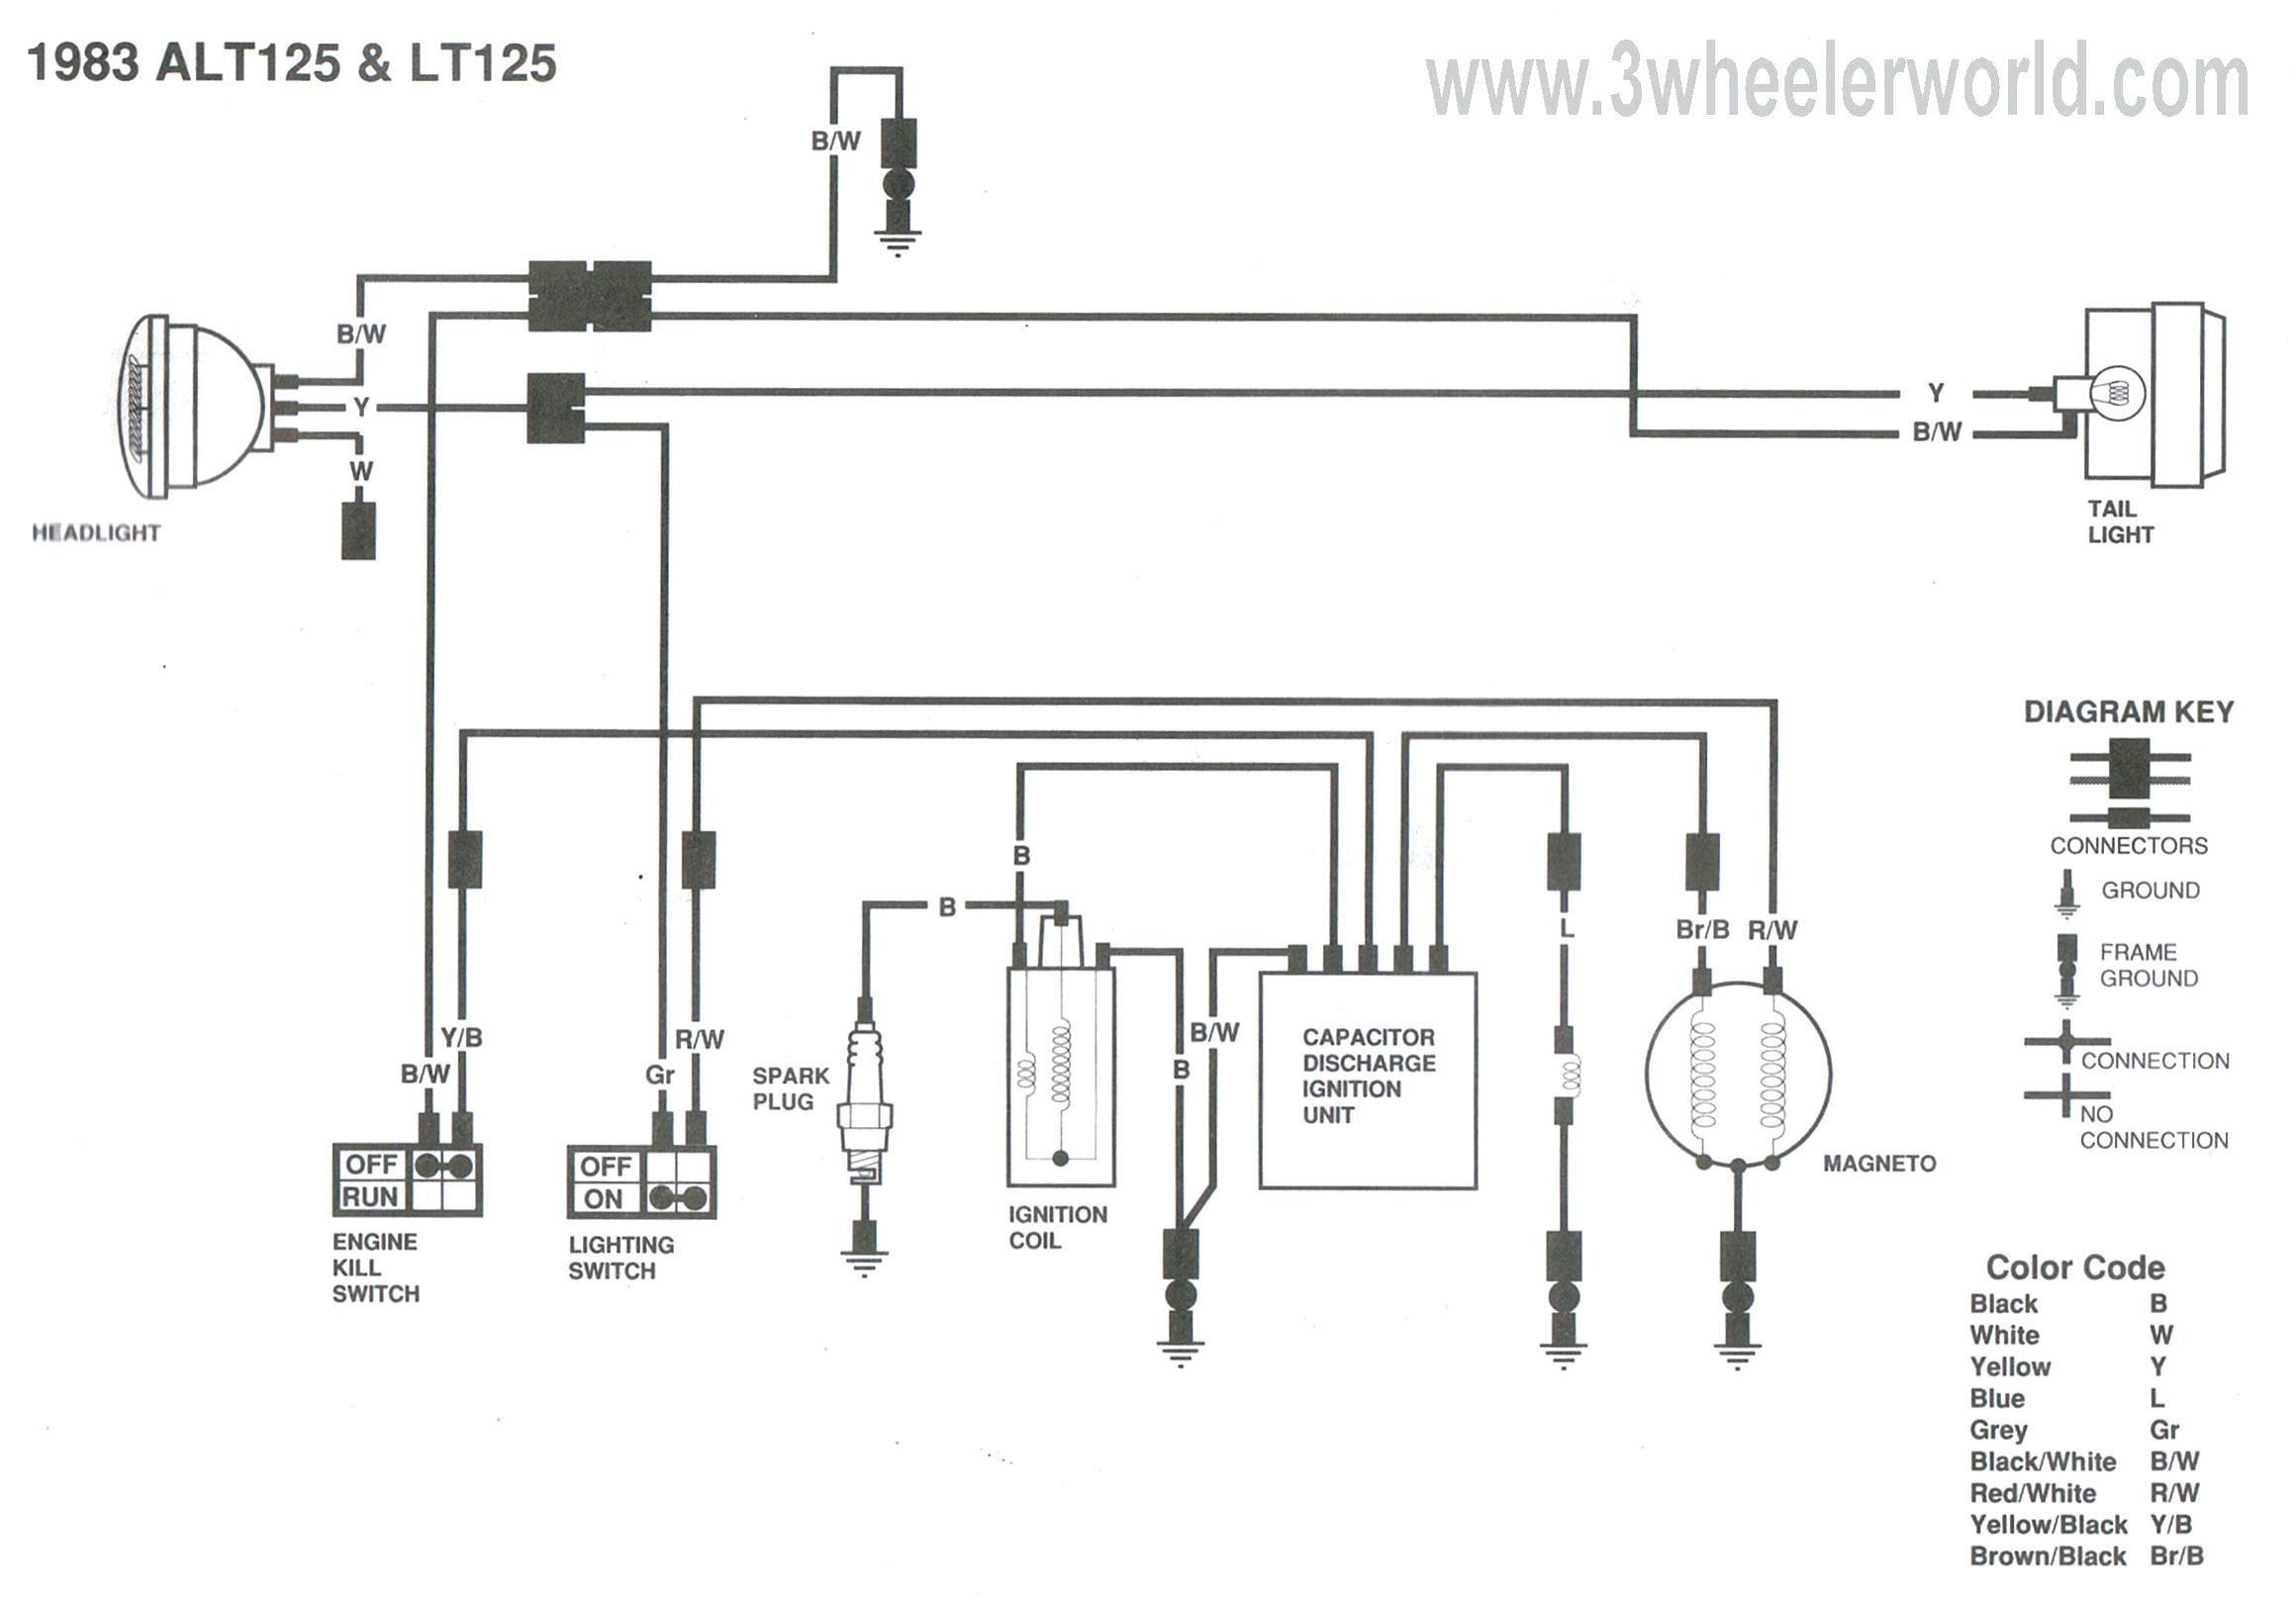 List Of Wiring Diagrams Mopedwiki Schematic Peugeot Xps 125 Diagram Schematics Lighted Doorbell Button